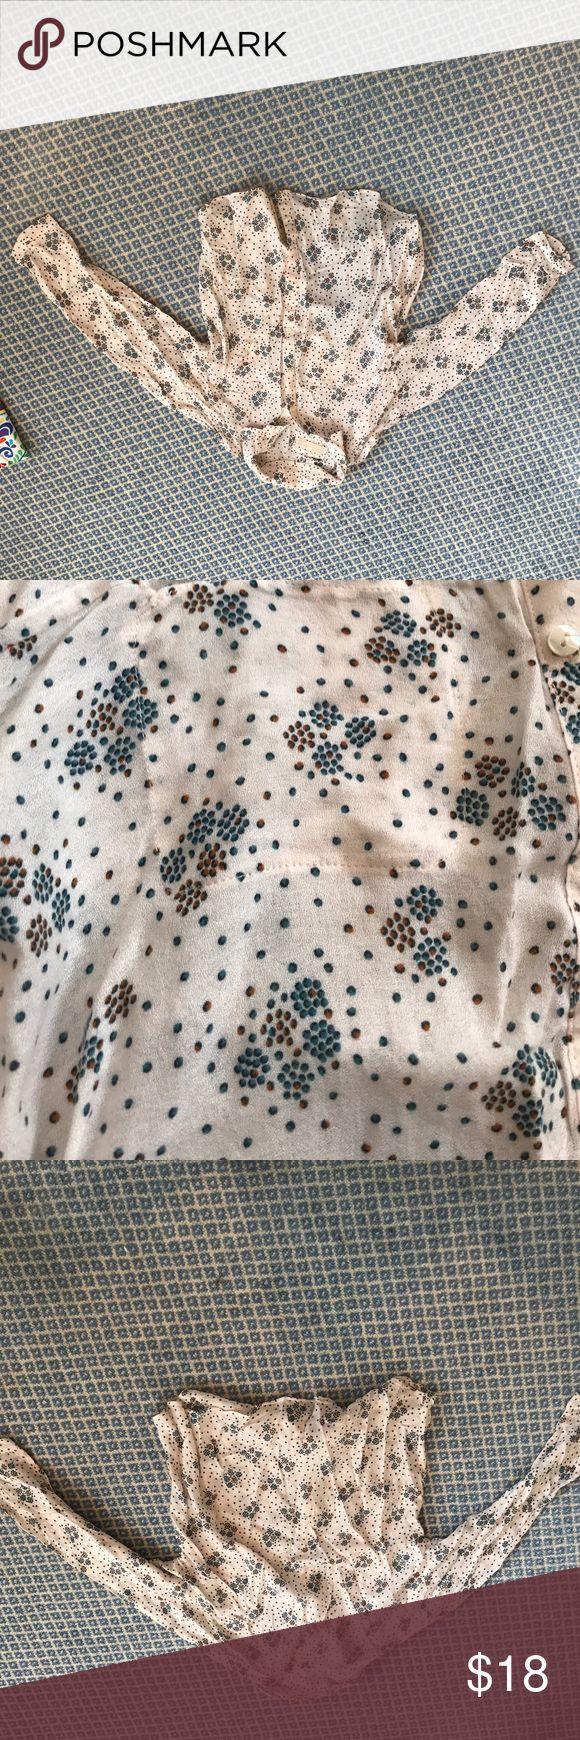 Selling this Size 9-10 Zara girls blouse on Poshmark! My username is: greenwichstyle. #shopmycloset #poshmark #fashion #shopping #style #forsale #Other